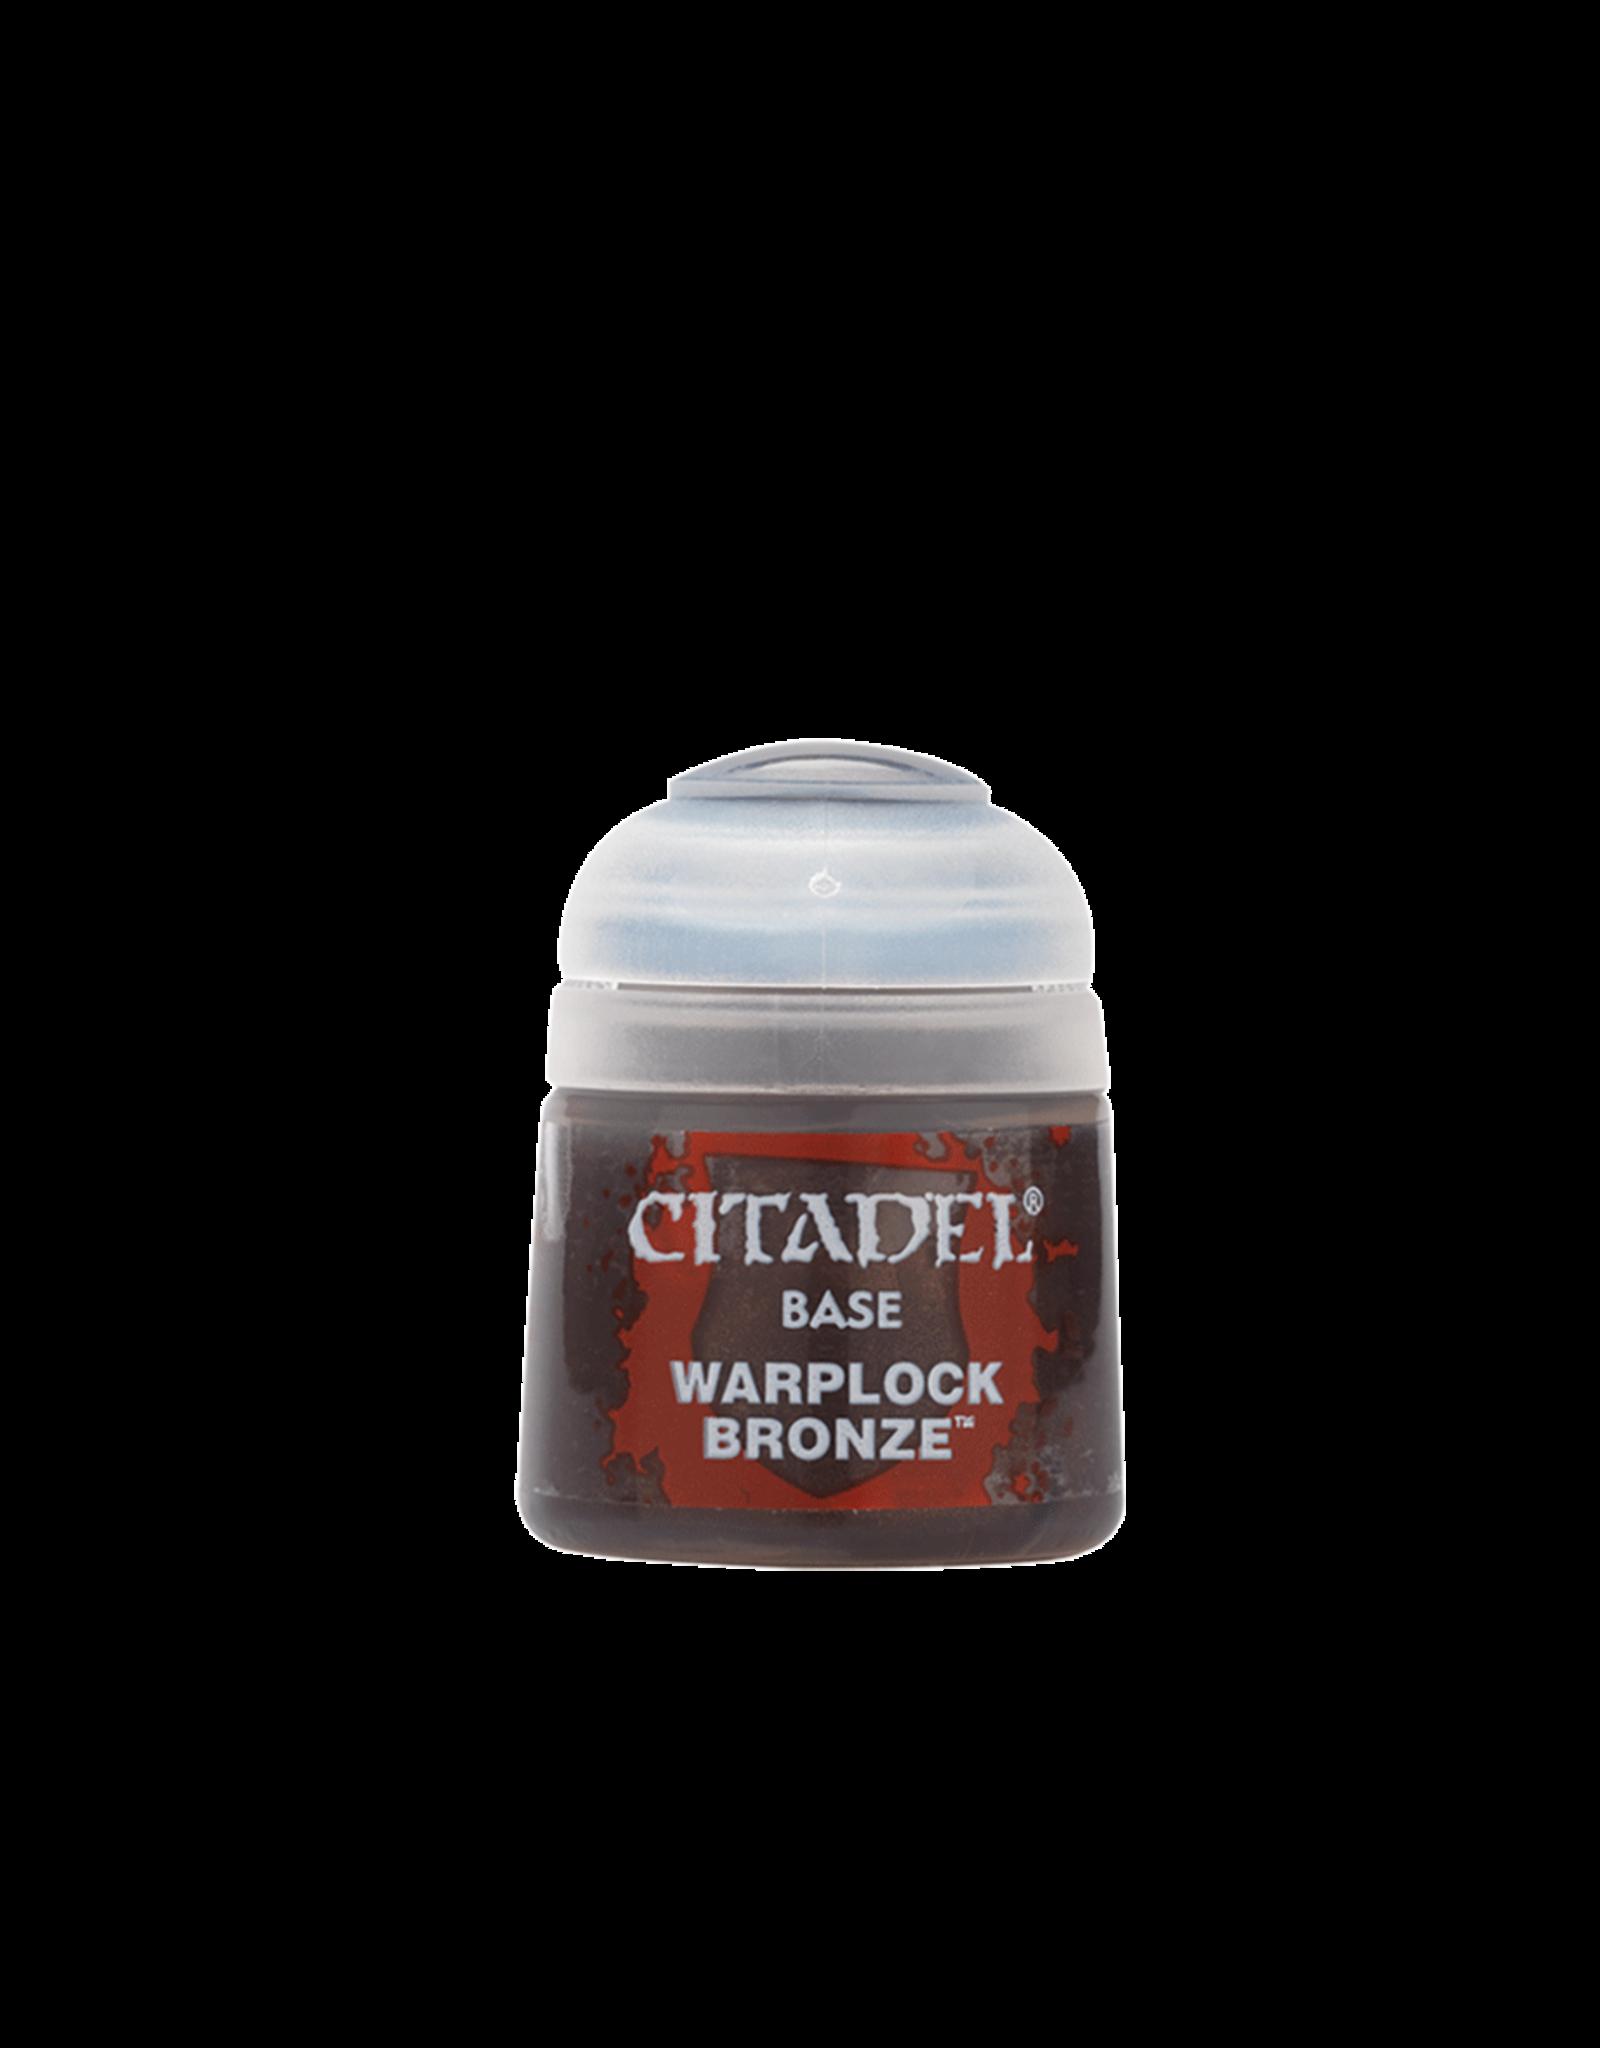 Citadel Citadel Paints: Base -  Warplock Bronze